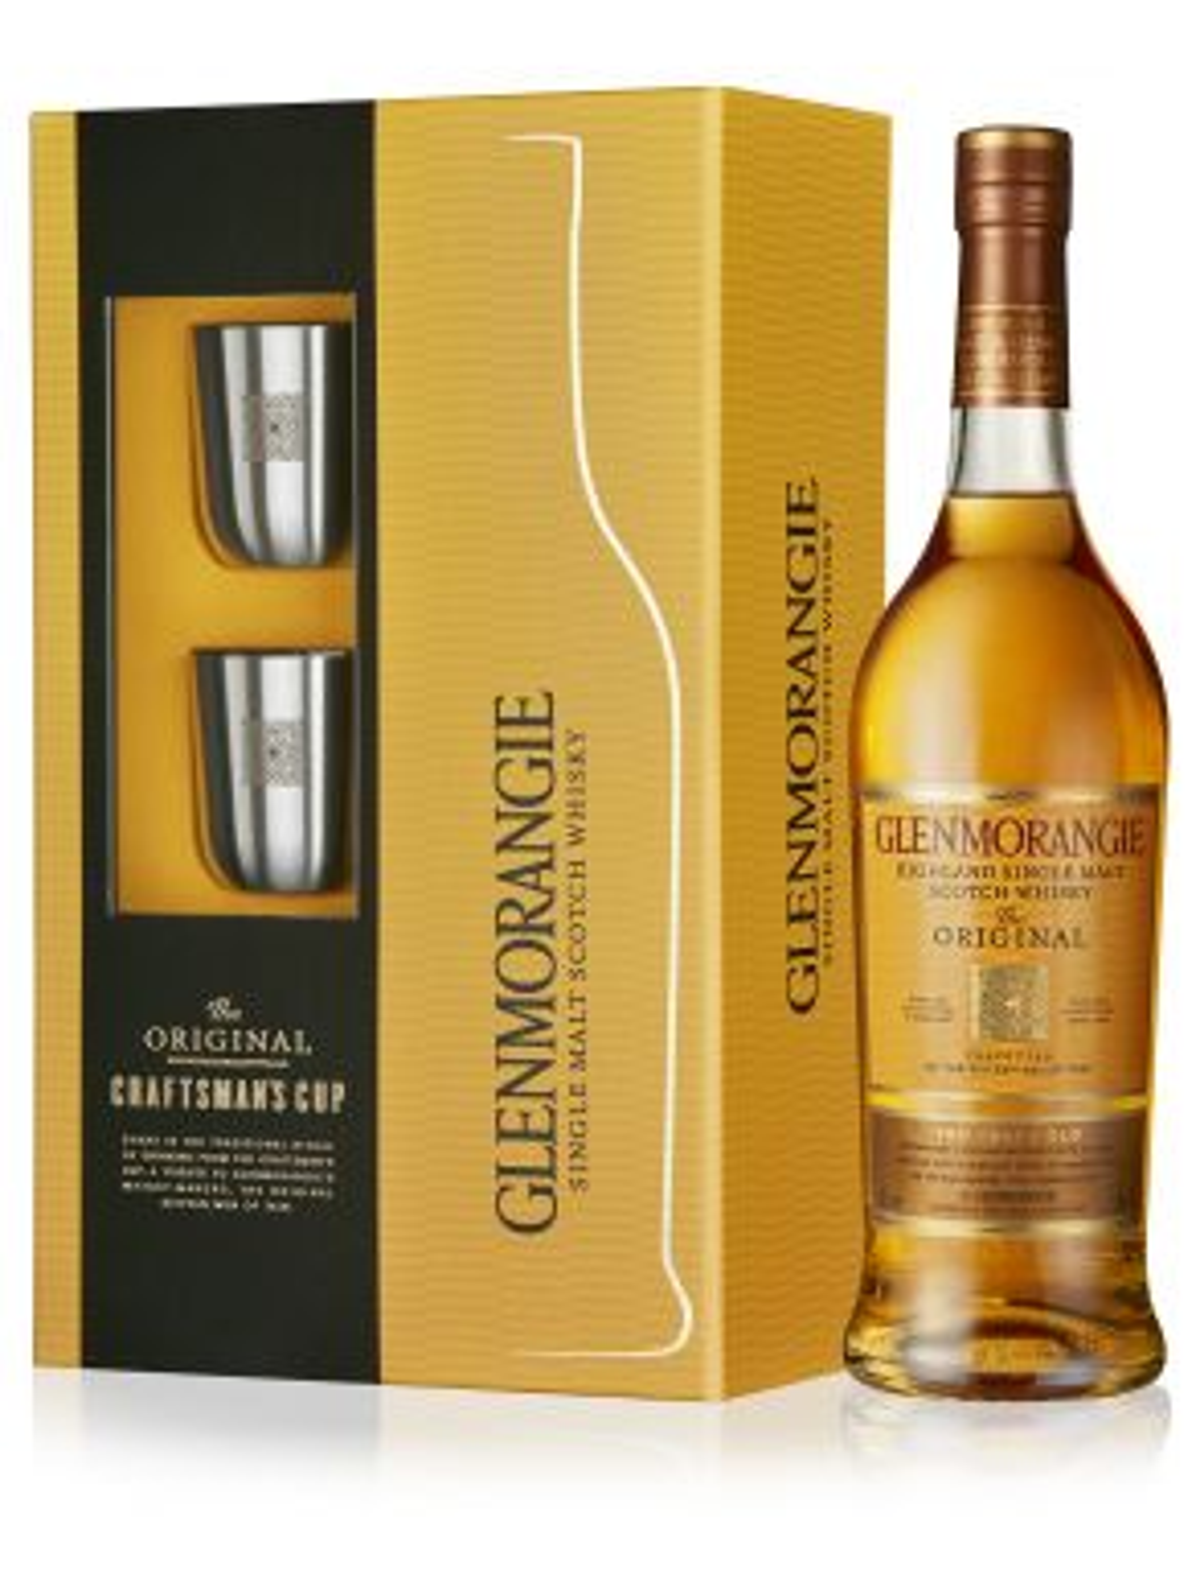 Glenmorangie 10 Year Old Single Malt Whisky Craftman's Cup Gift Set